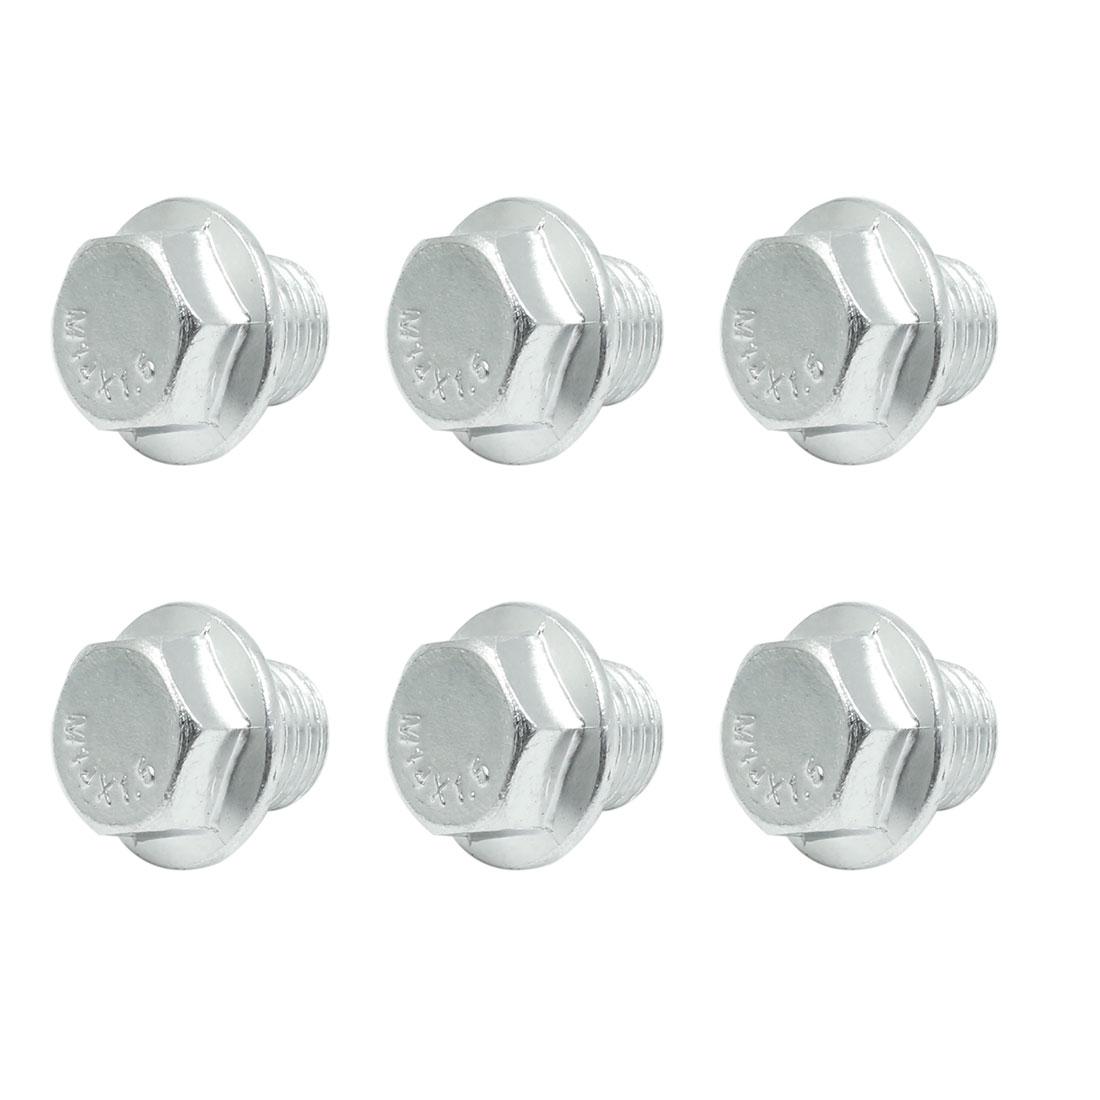 6pcs 23.5 x 21.5mm Car Silver Tone Magnetic Engine Oil Pan Drain Plug Bolt